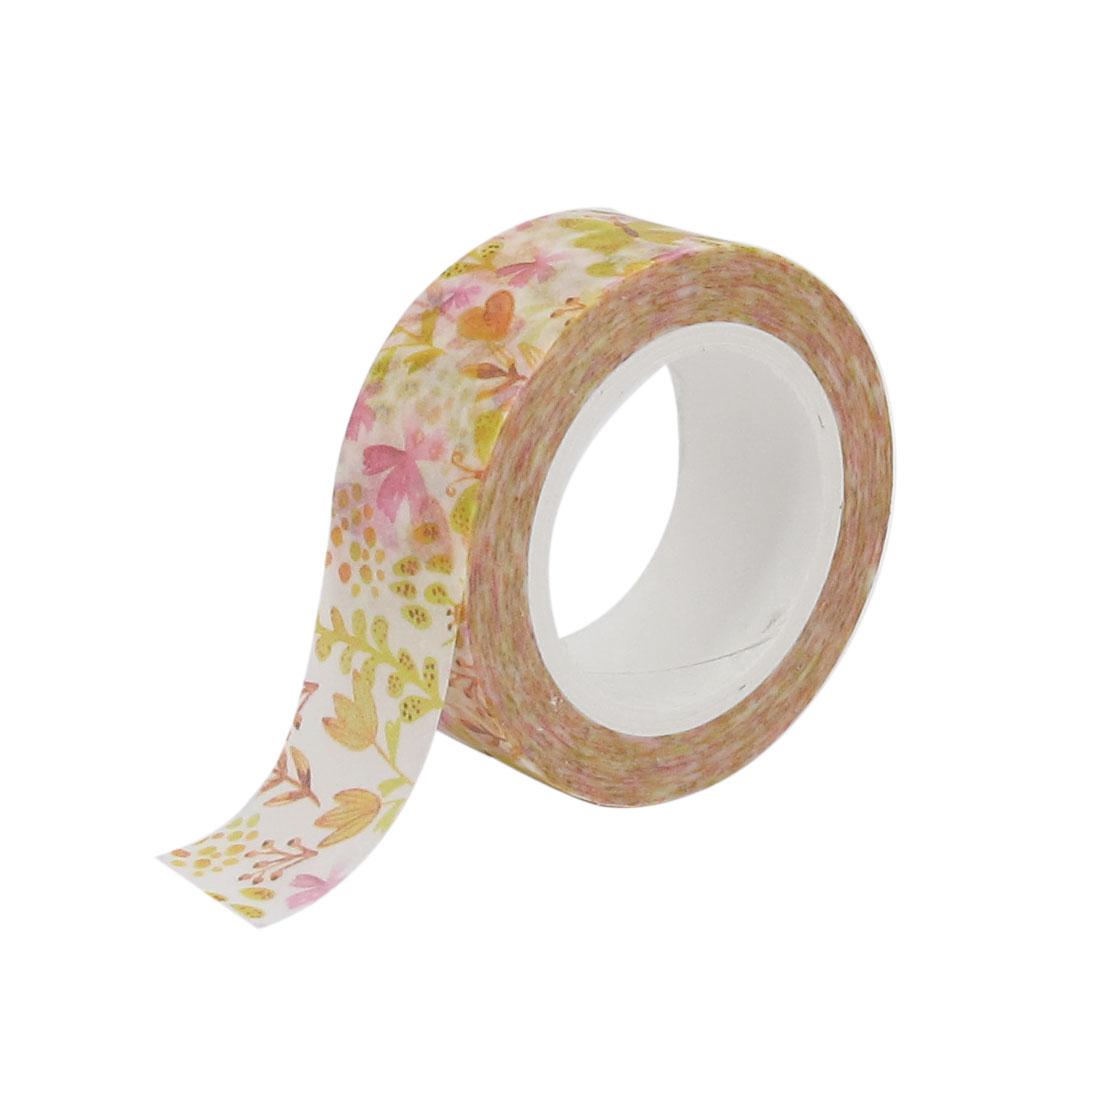 10m Decorative Self Adhesive Masking Washi Tape Sticky Paper Sticker